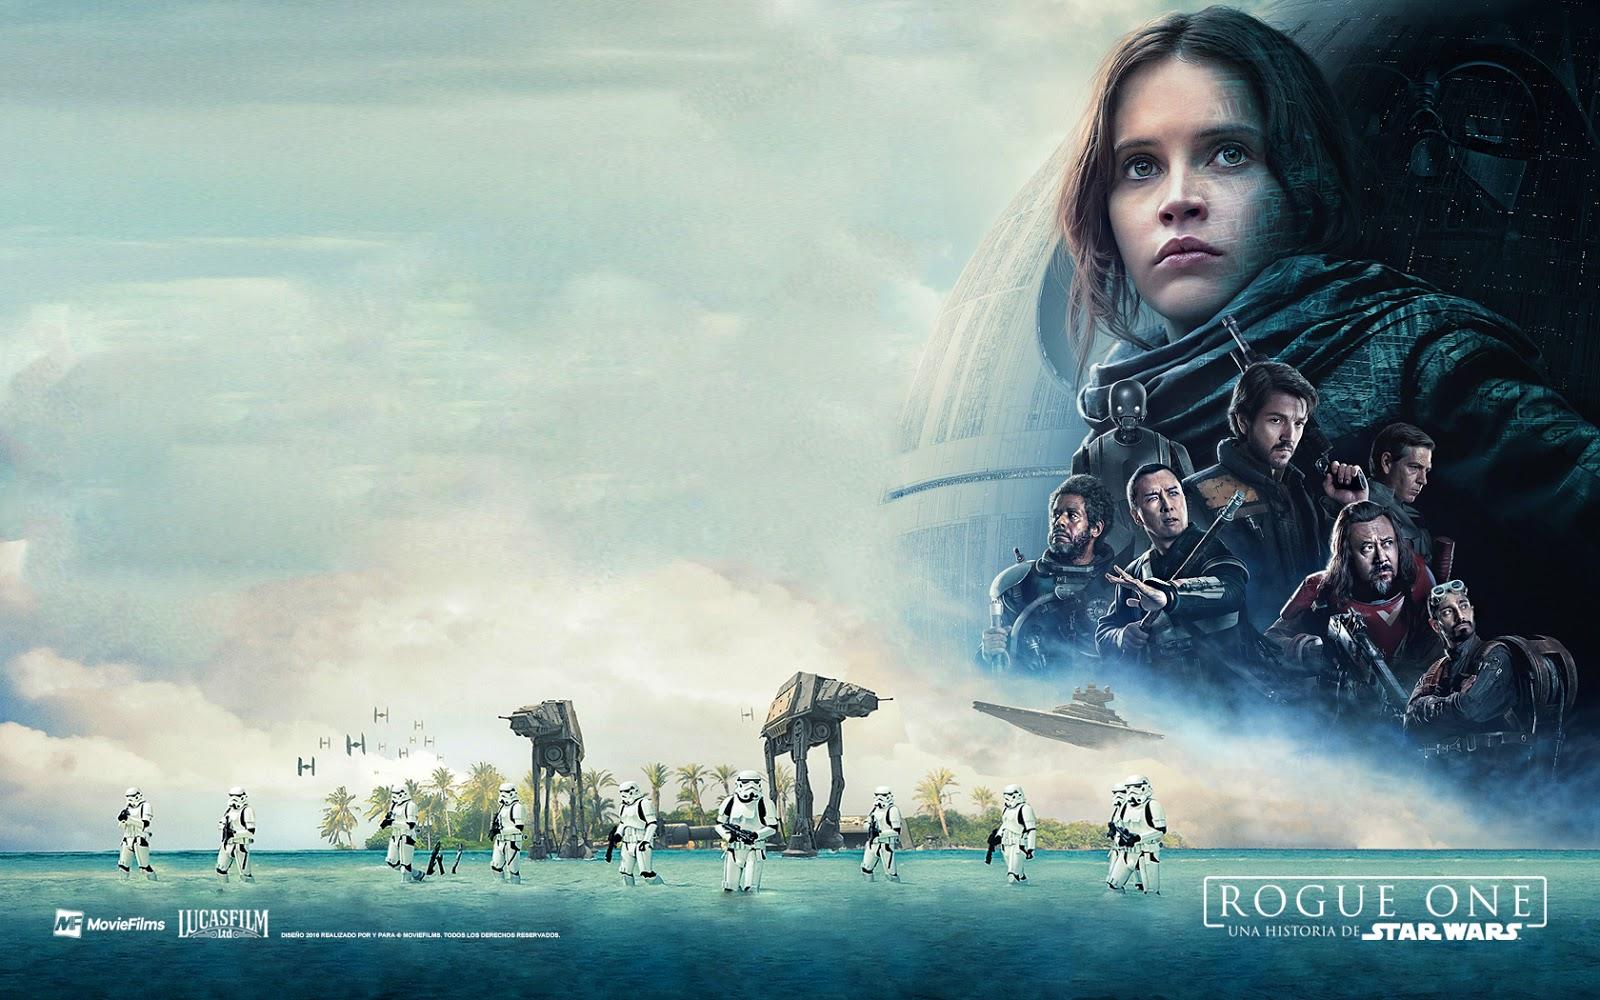 Wallpaper Para Latinoamérica De Rogue One - Solo A Star Wars Story , HD Wallpaper & Backgrounds